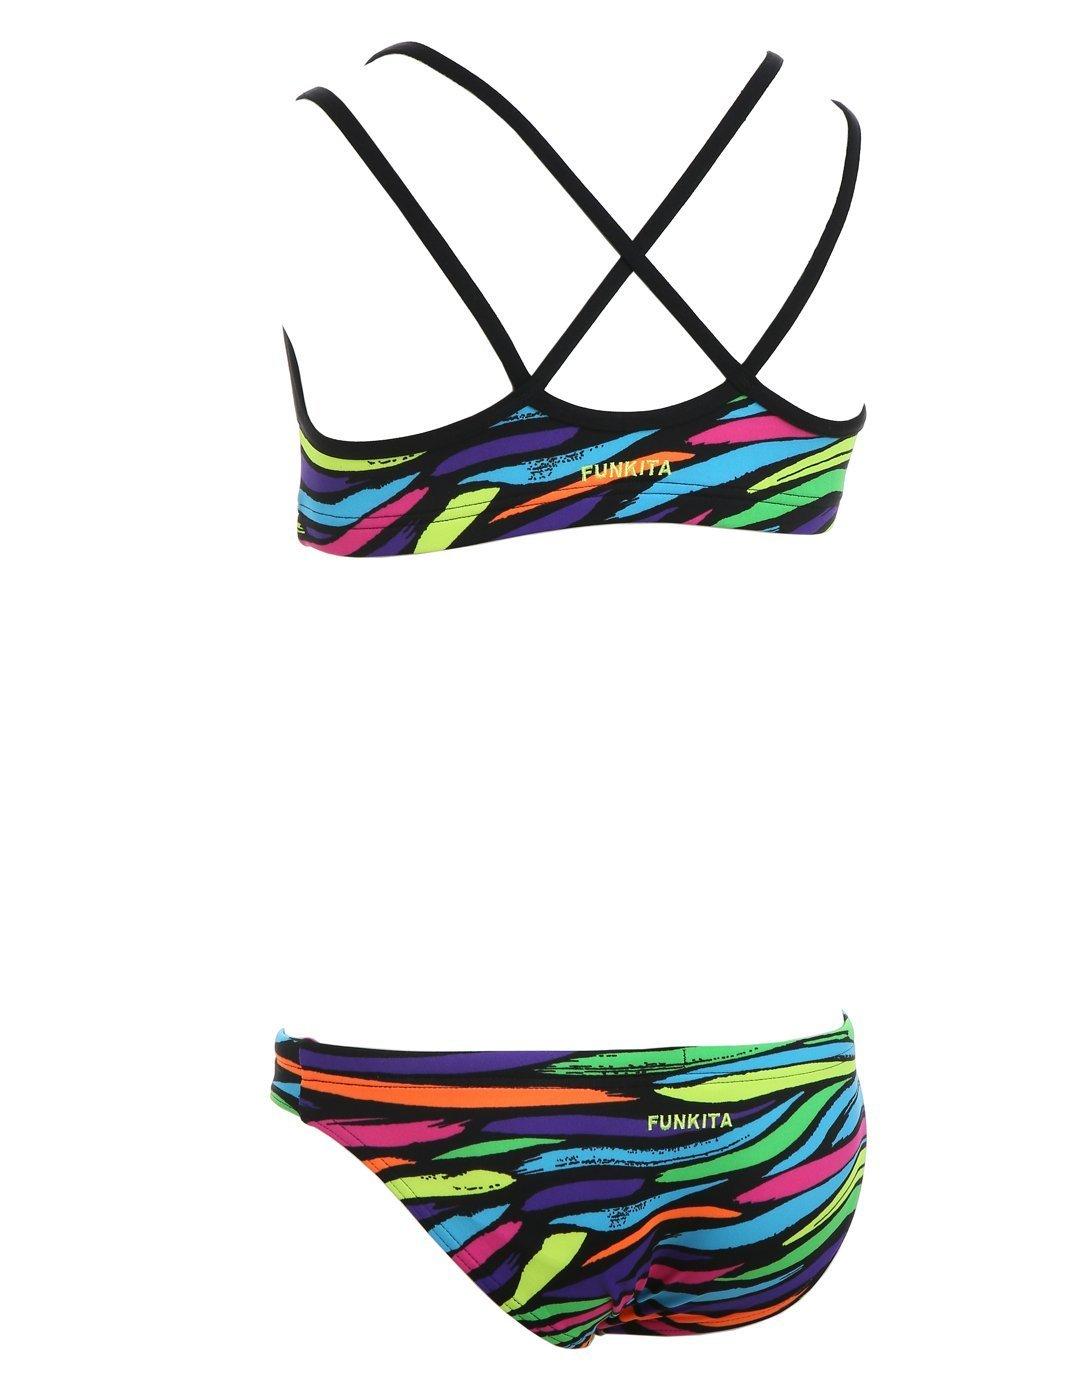 594371d27d94 Funkita Criss Cross Two Piece Cosmic Comet Mädchen Bikini, Bitte Größe  wählen 176  Amazon.de  Sport   Freizeit